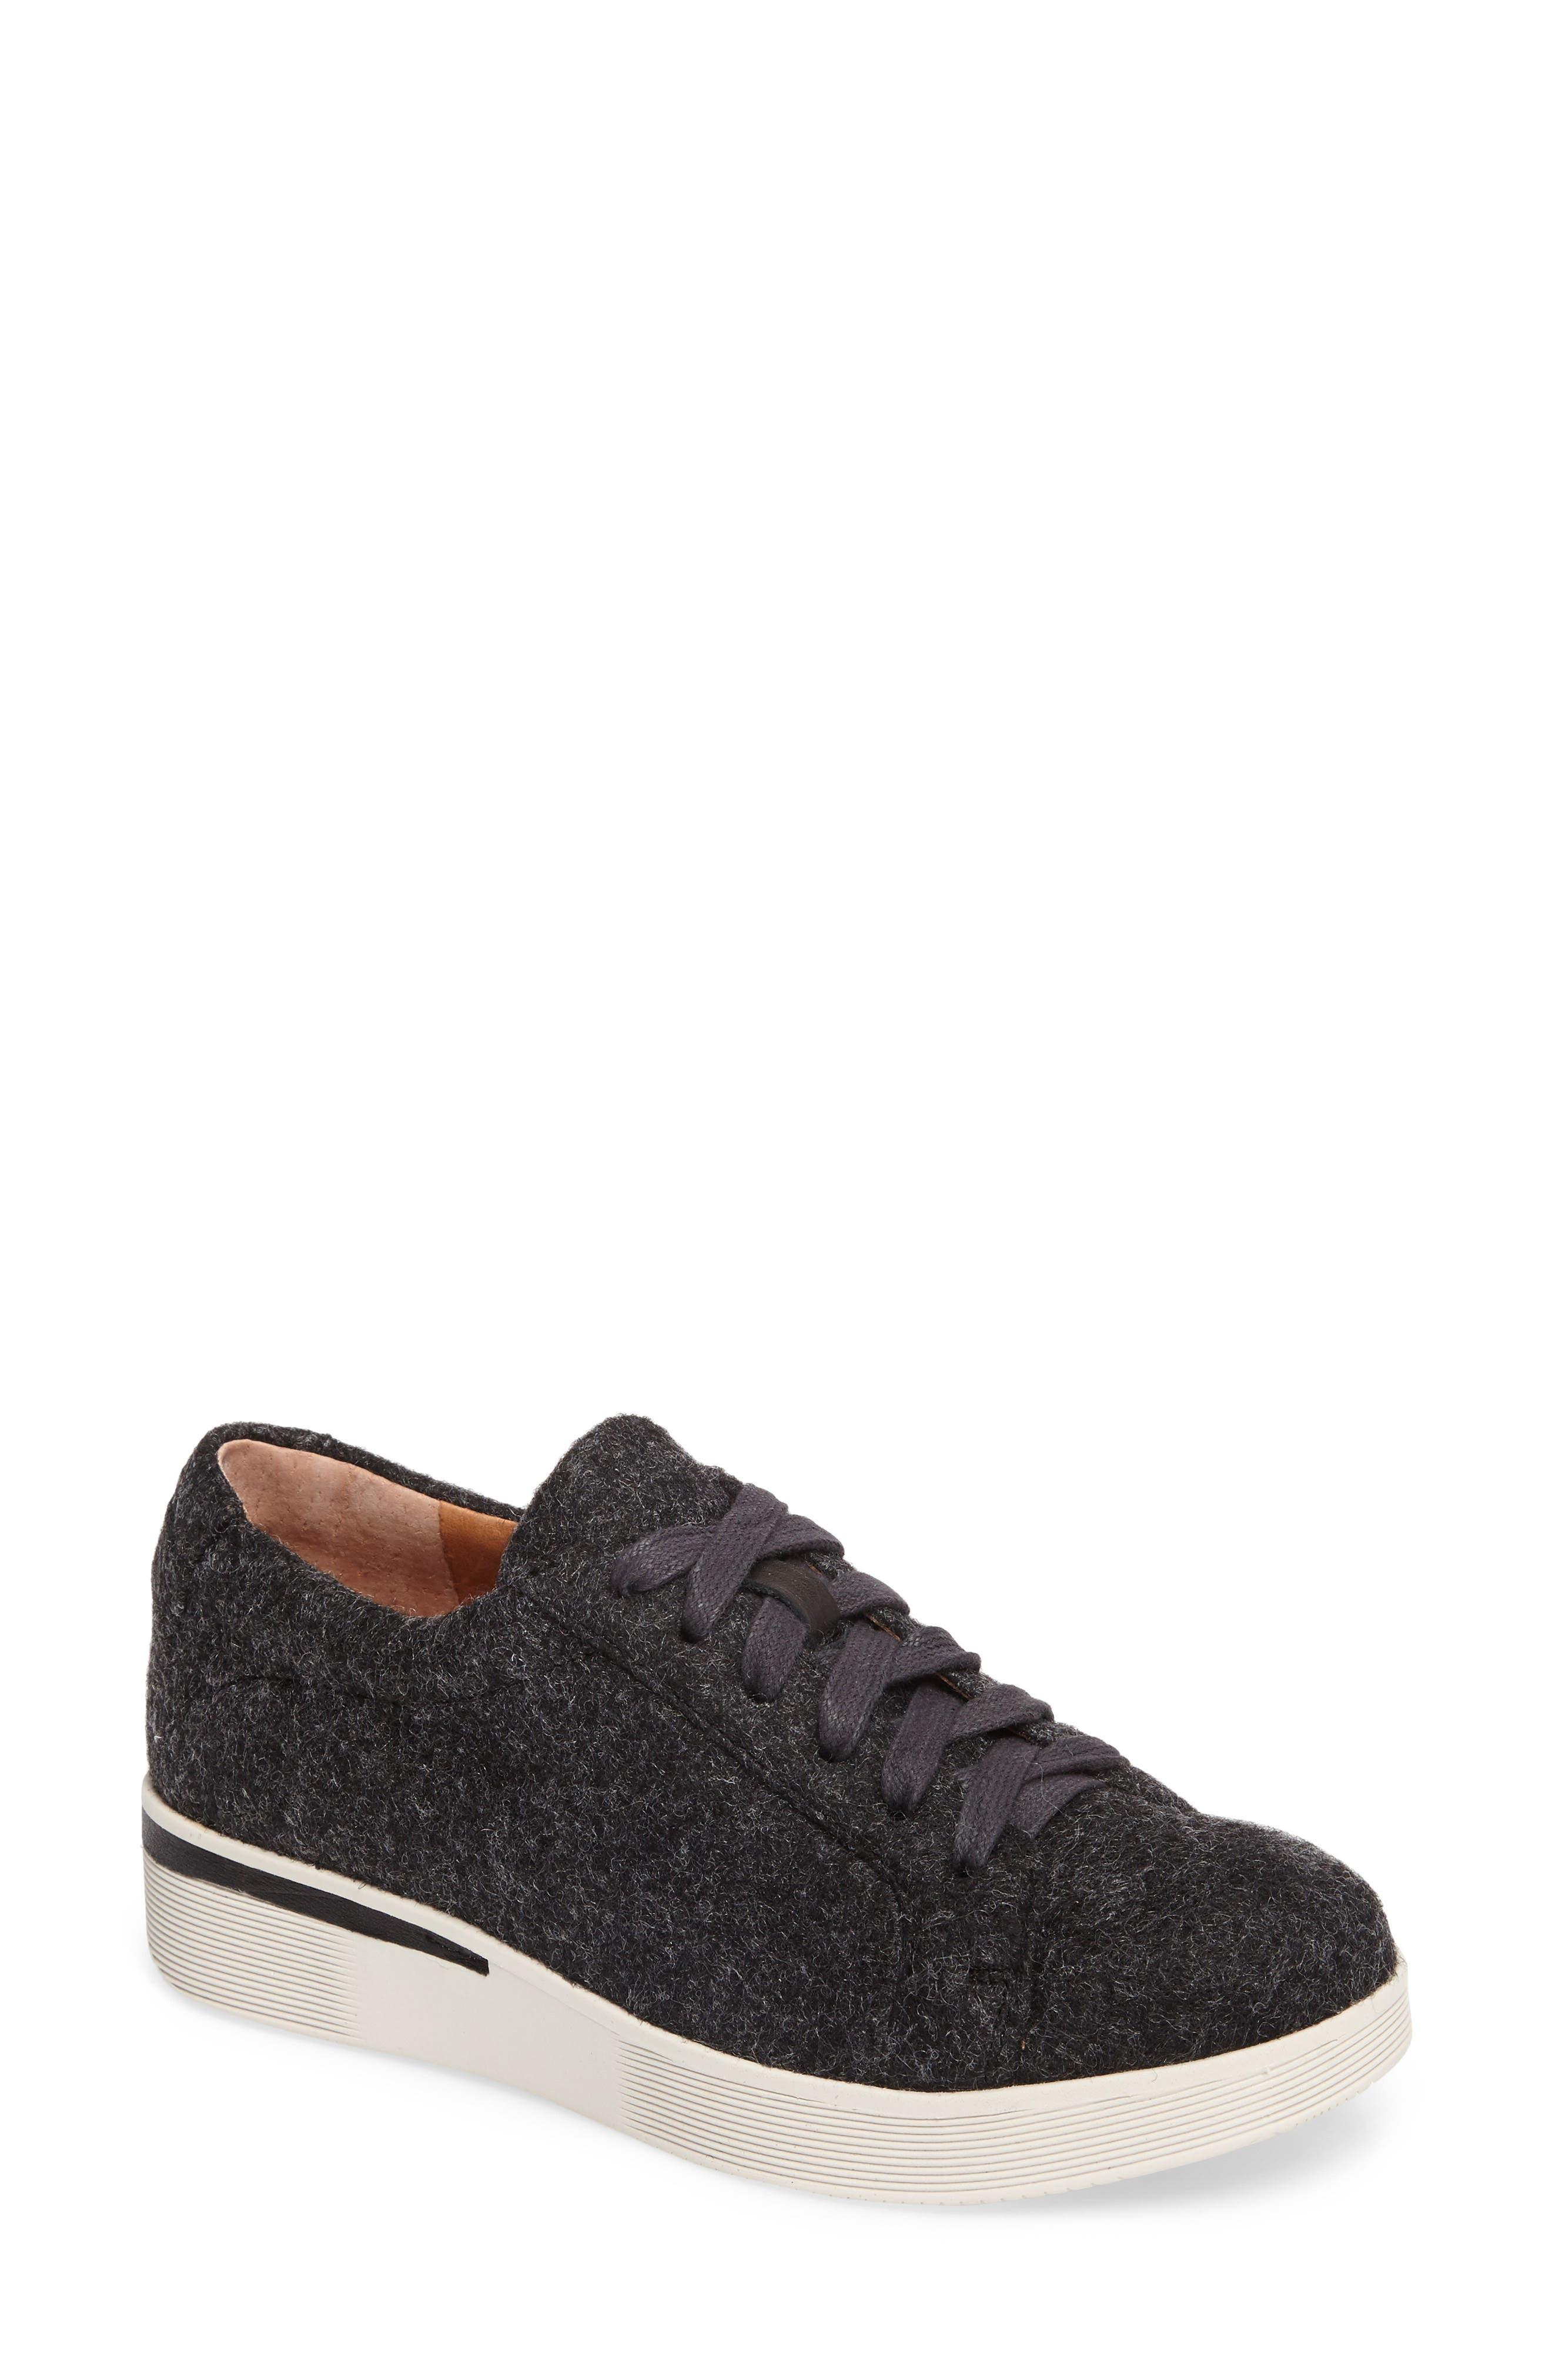 GENTLE SOULS BY KENNETH COLE Haddie Low Platform Sneaker, Main, color, HEATHER GREY WOOL